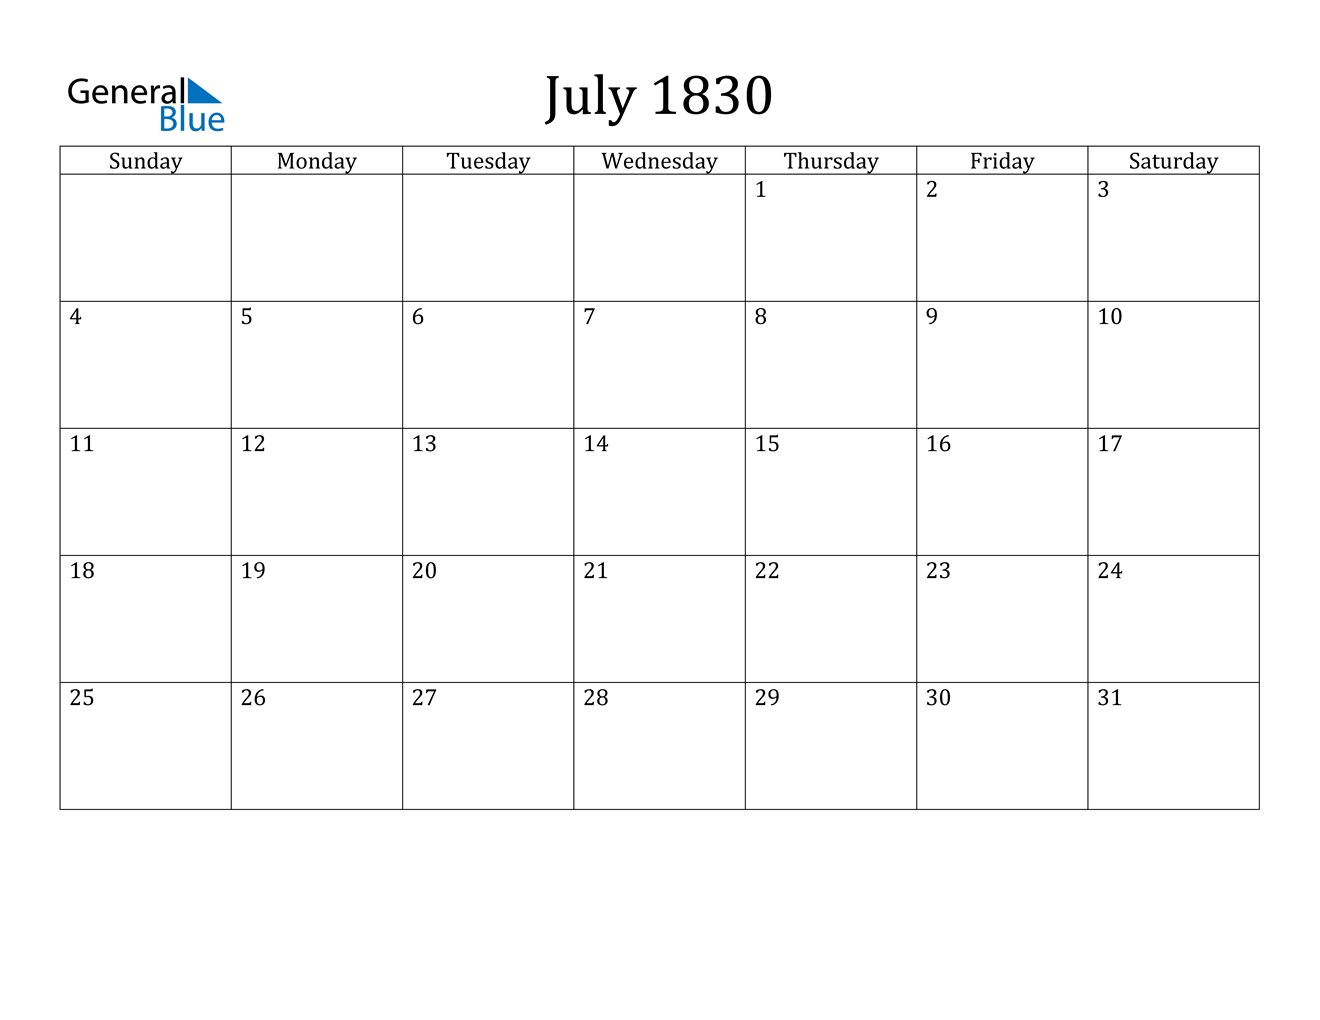 Image of July 1830 Calendar